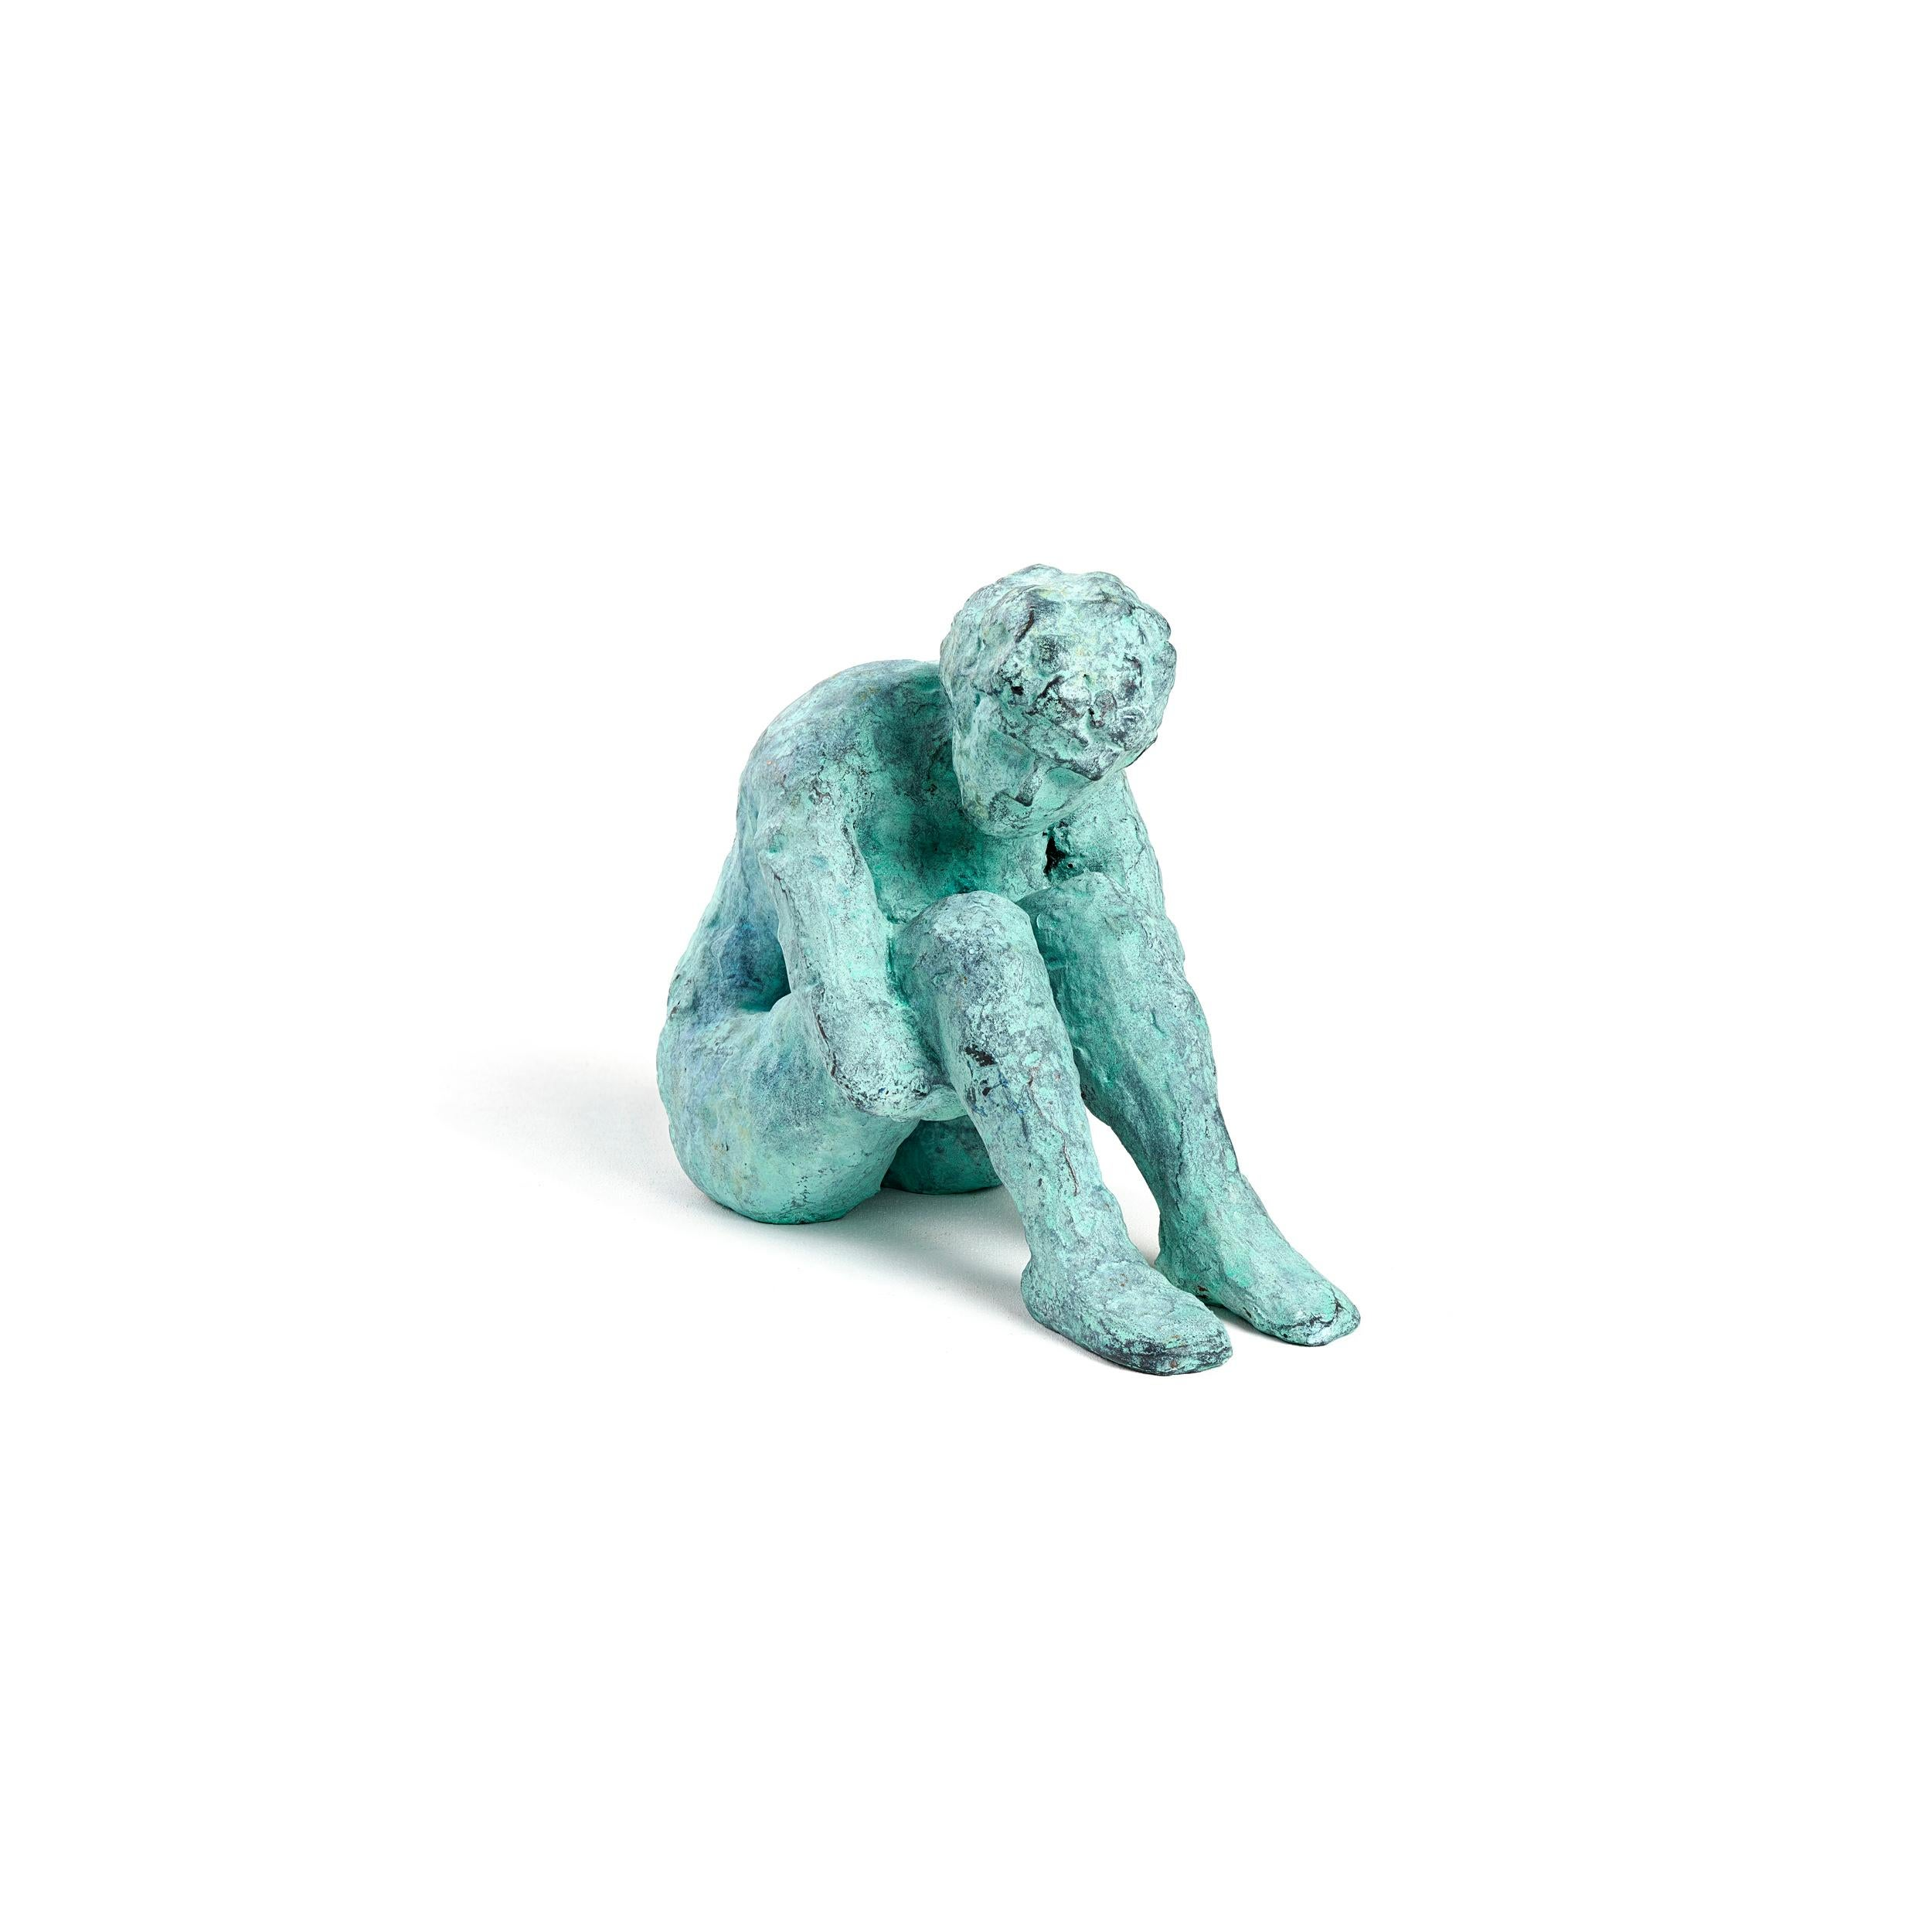 """Alex Withdrawn"" Figurative Sculpture, Blue, Green - Unique Multiples"